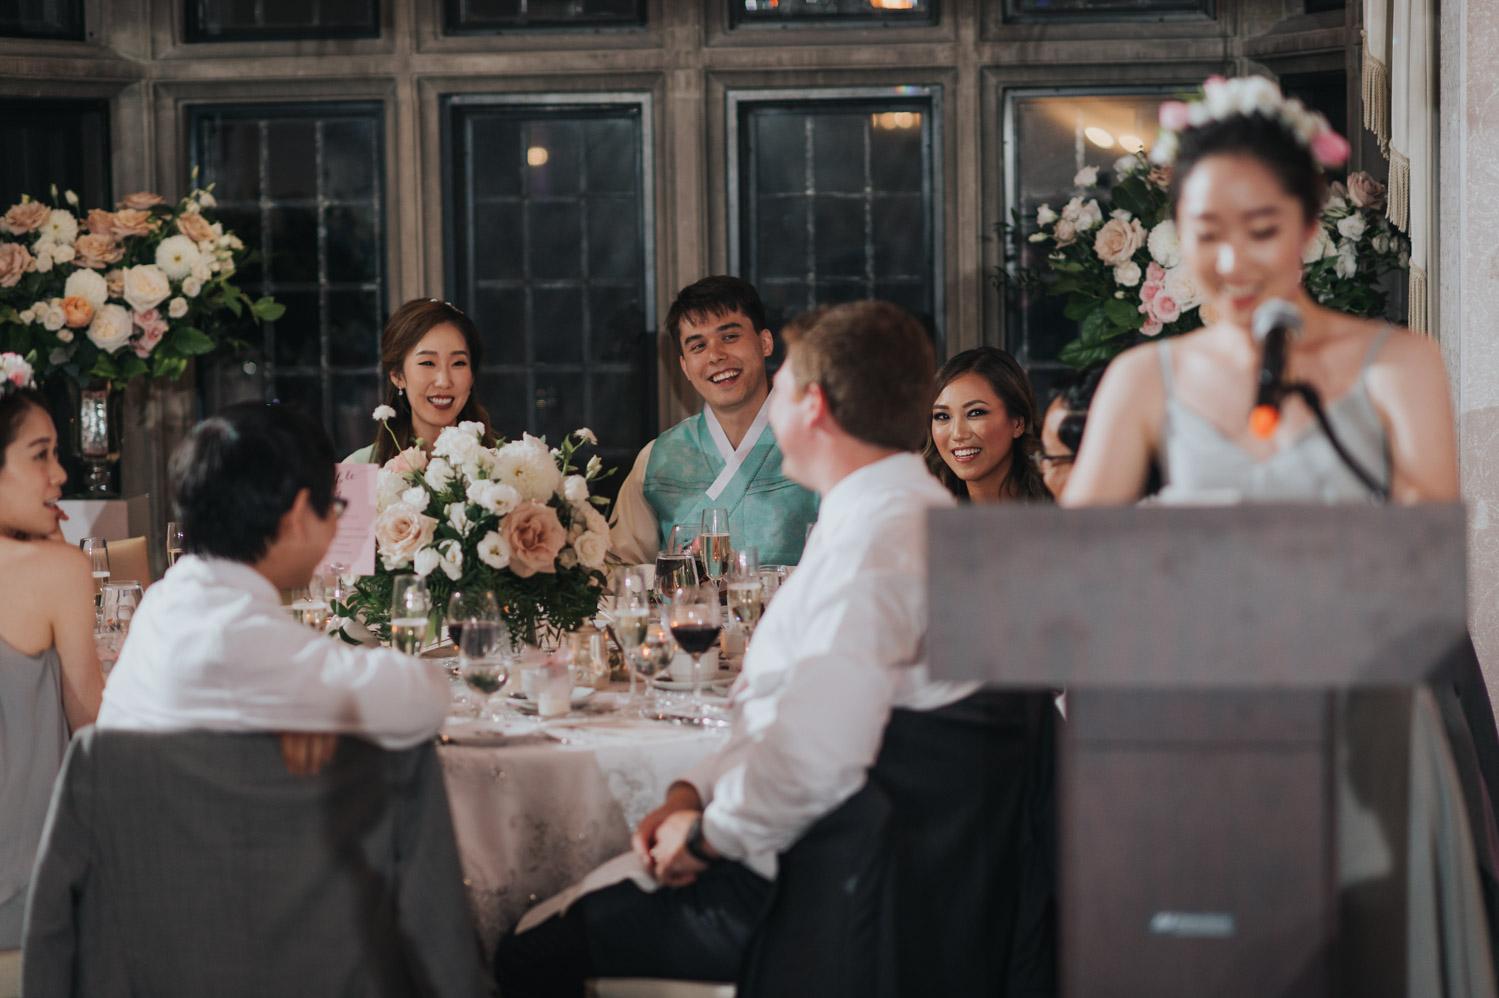 Speech at Estates of Sunnybrook Wedding Reception